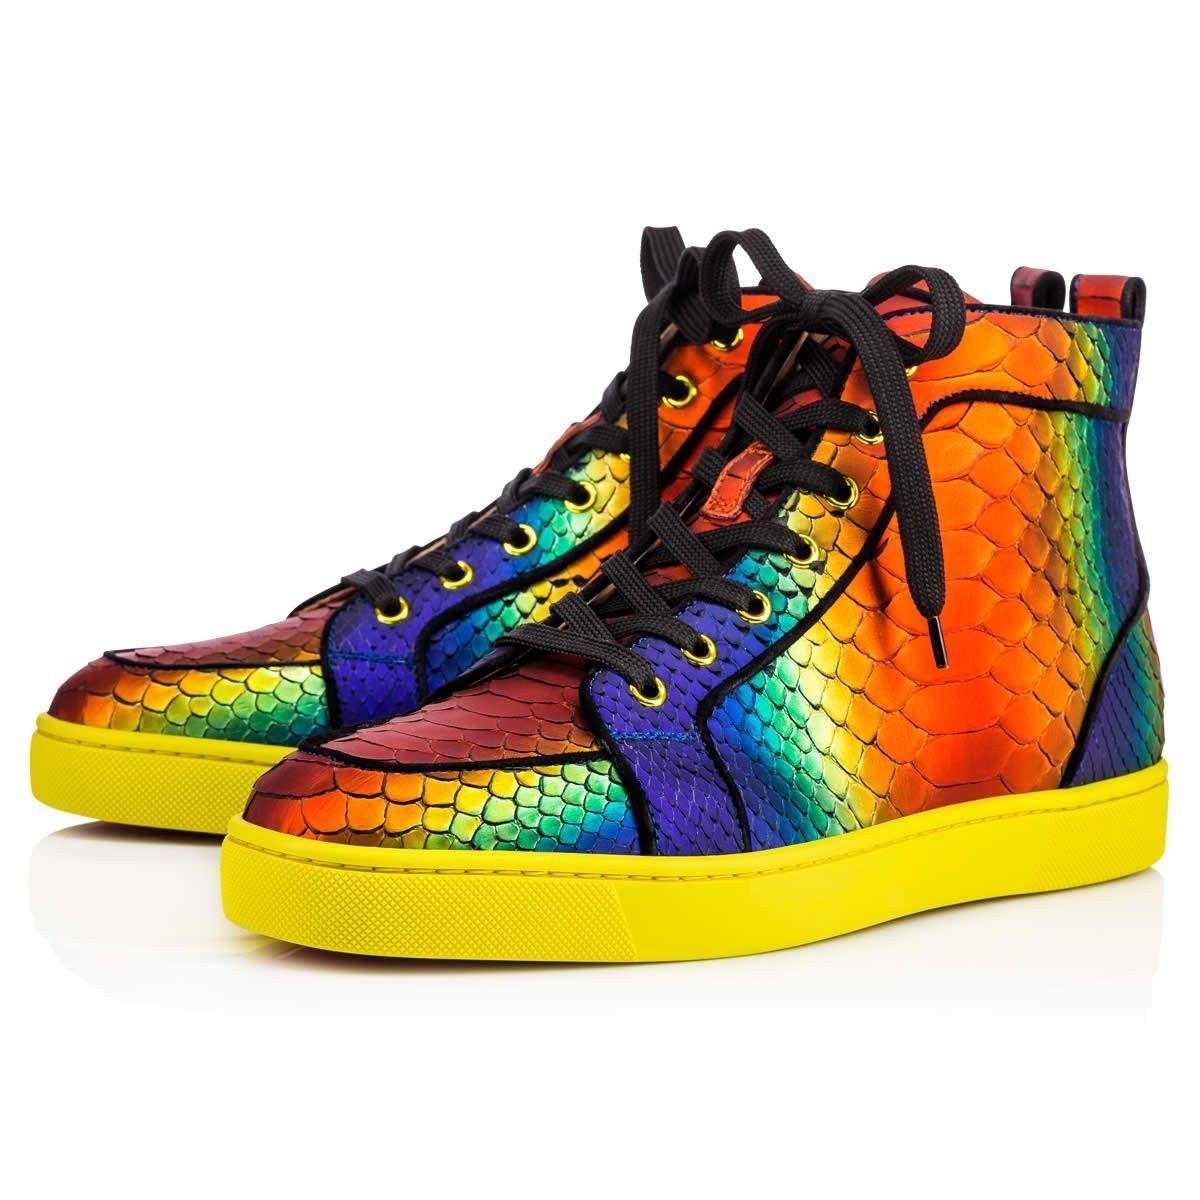 69a9b91cdbb Christian Louboutin Rantus Orlato Men s Flat sneakers in rainbow python  leather  1995.